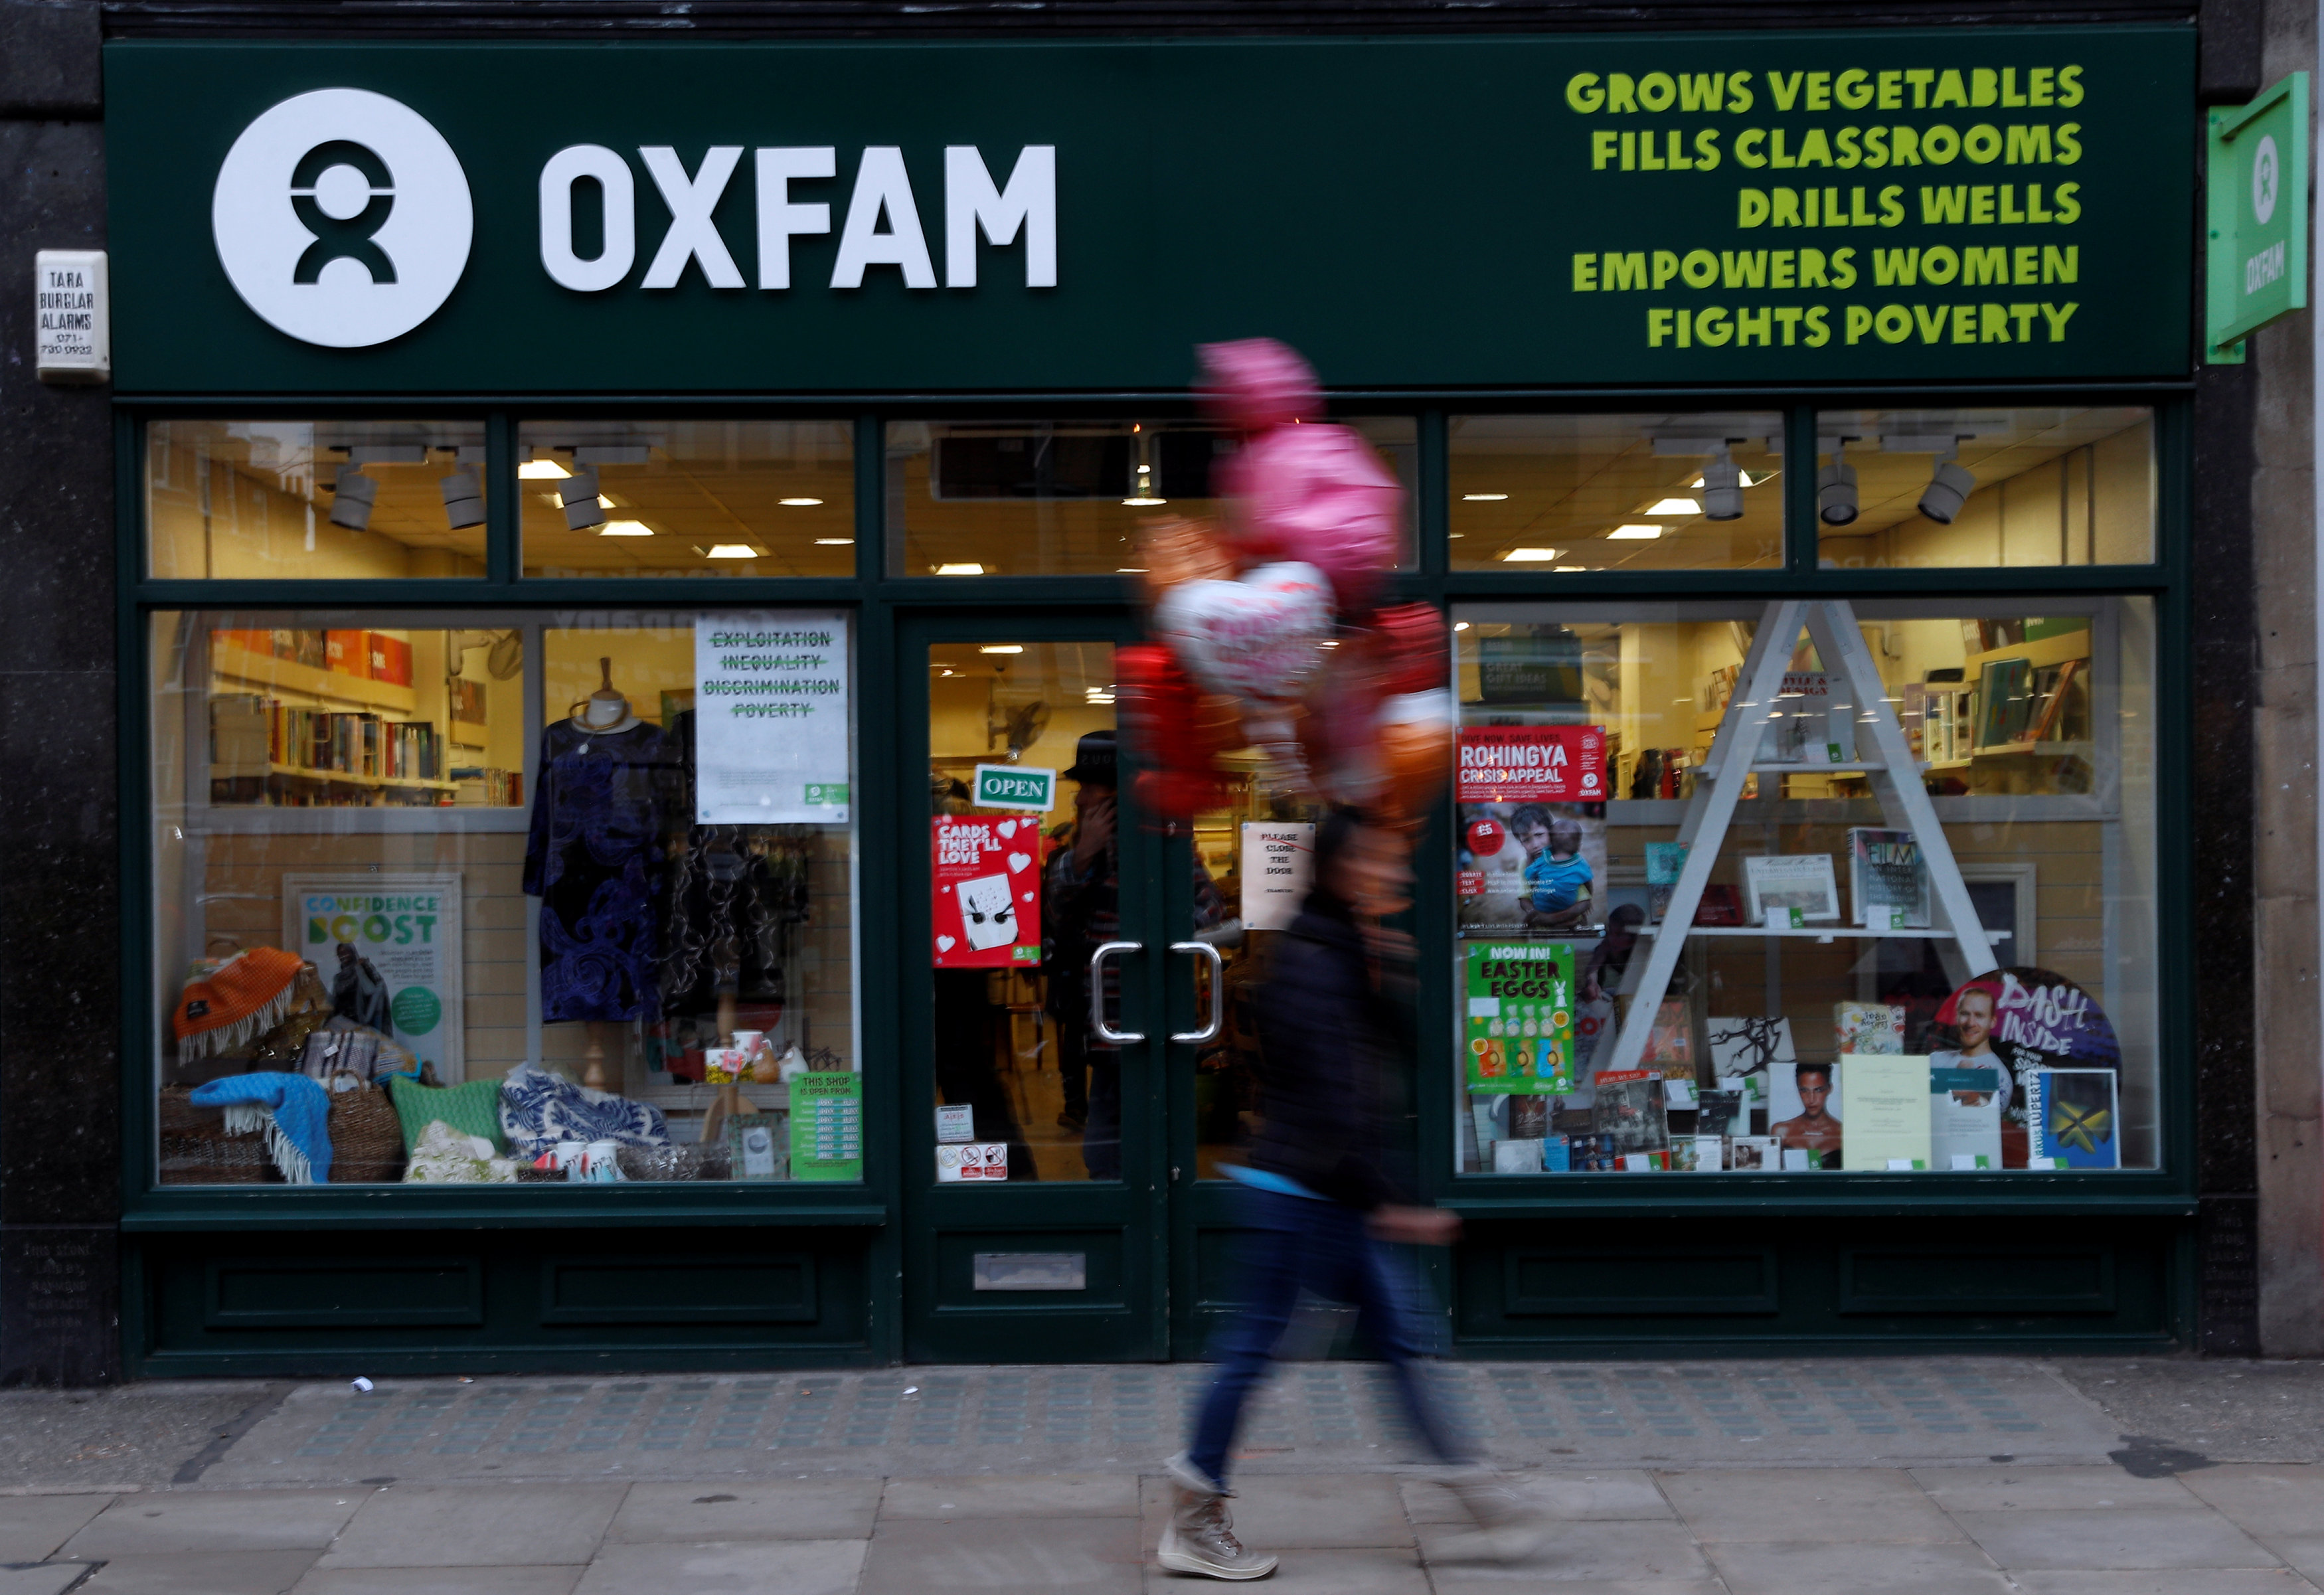 Una oficina de Oxfam en London. (REUTERS/Peter Nicholls)